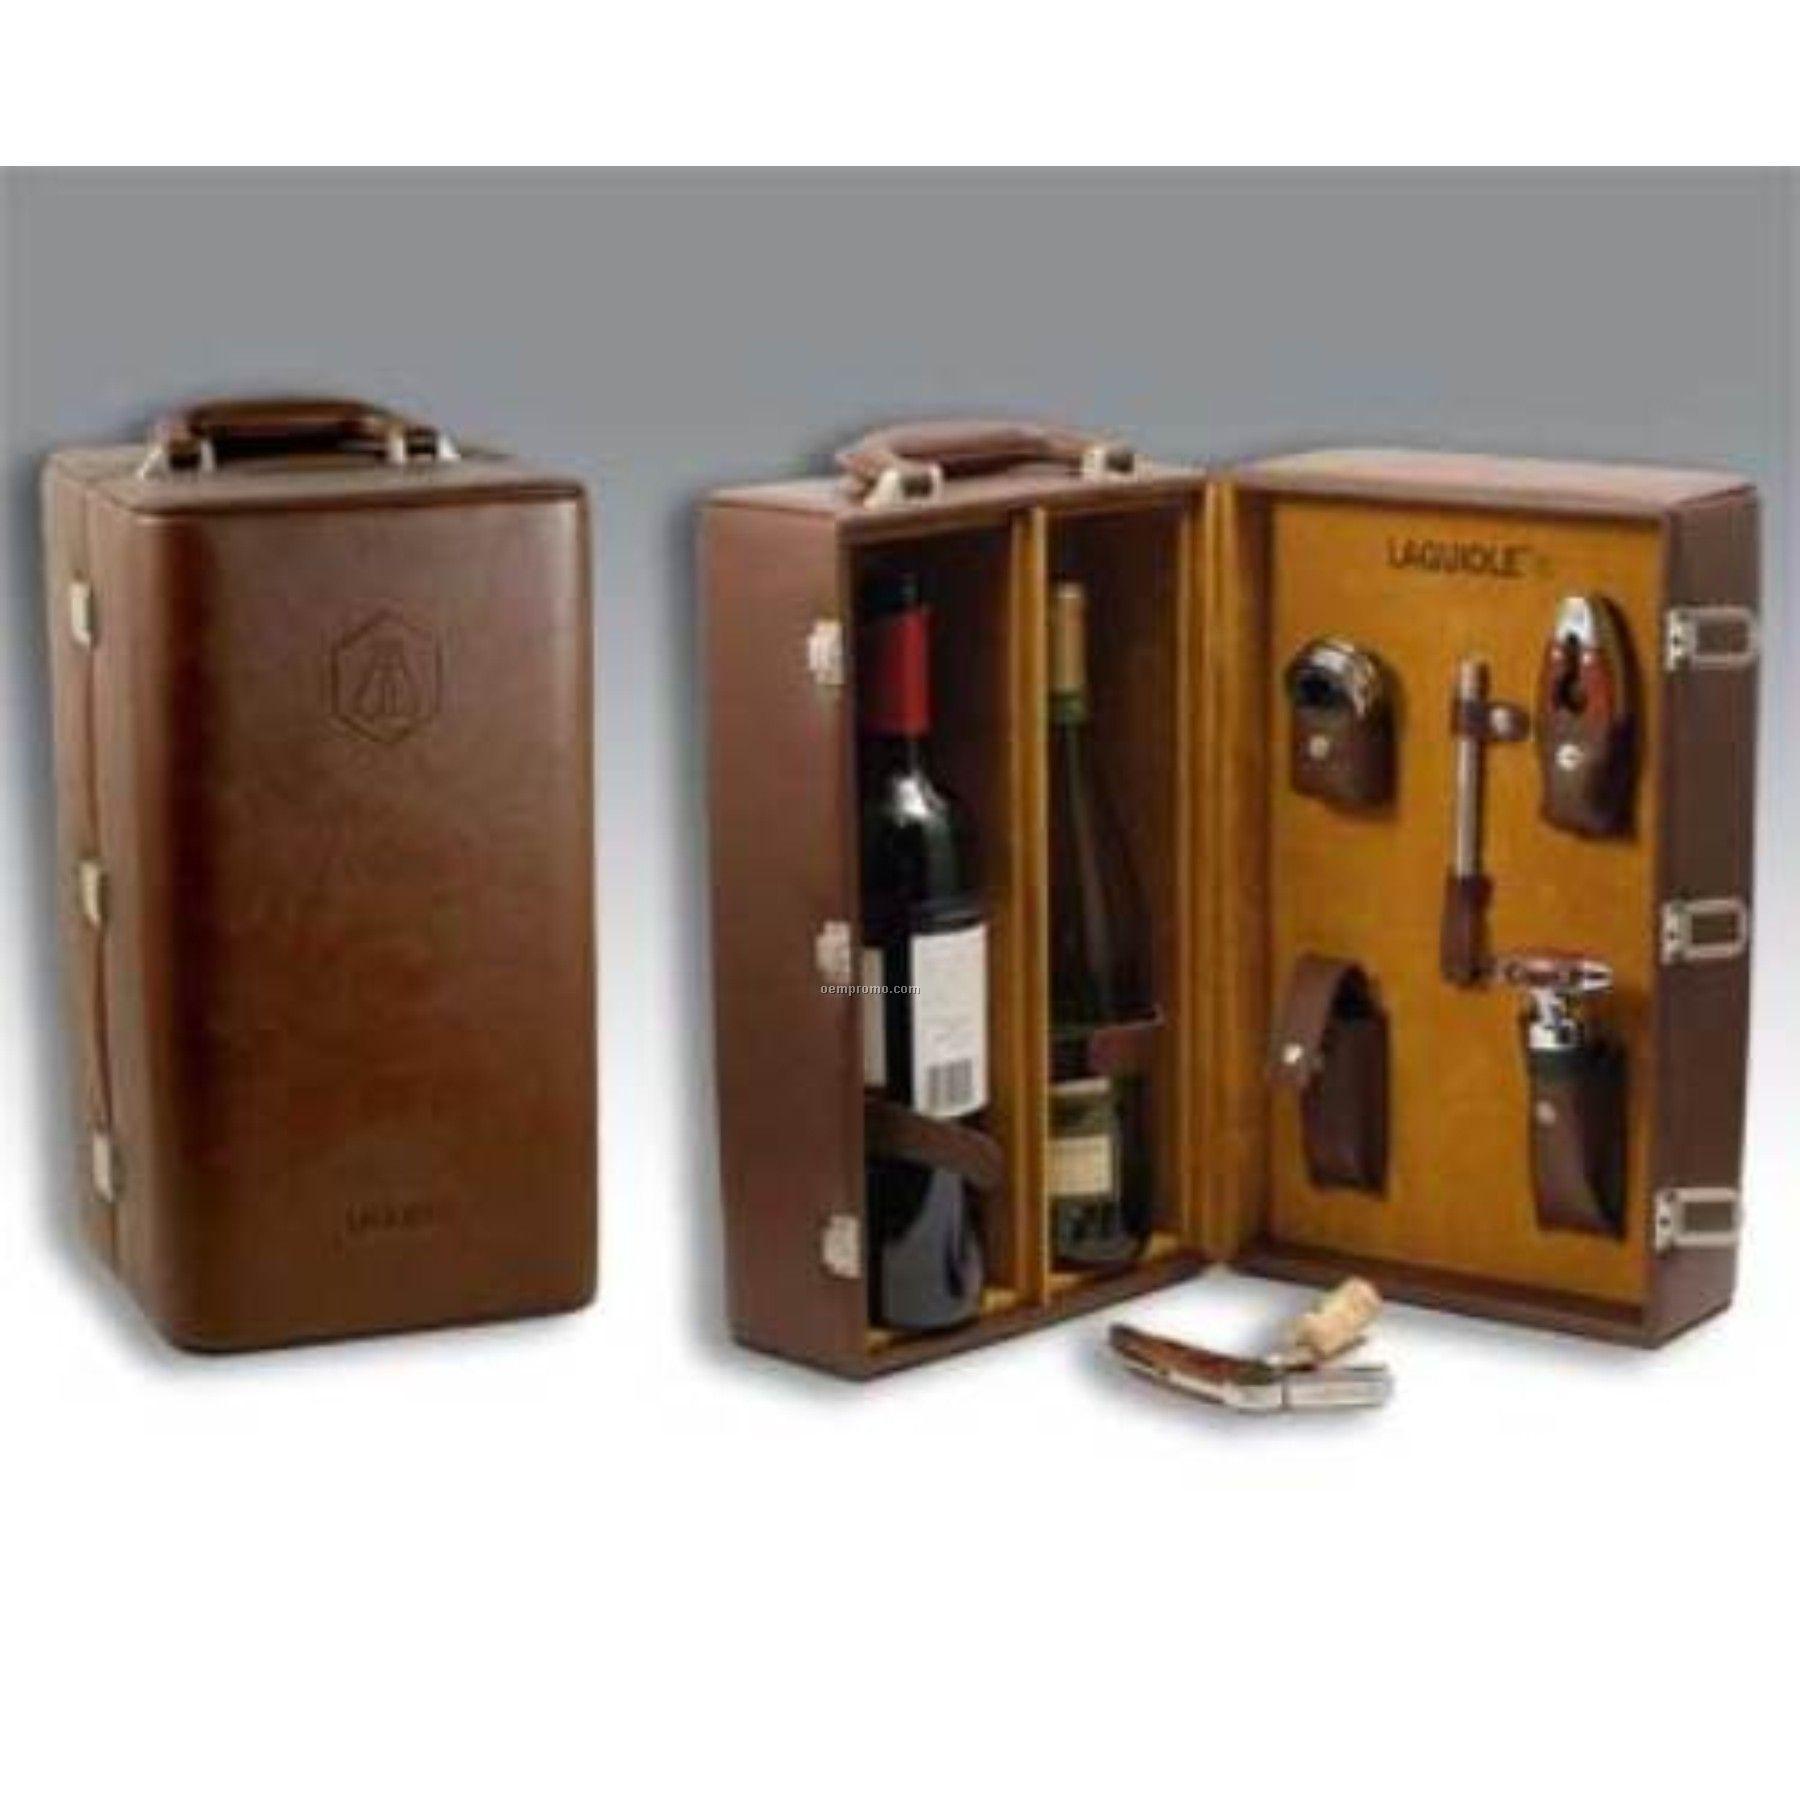 Laguiole Wine Valise